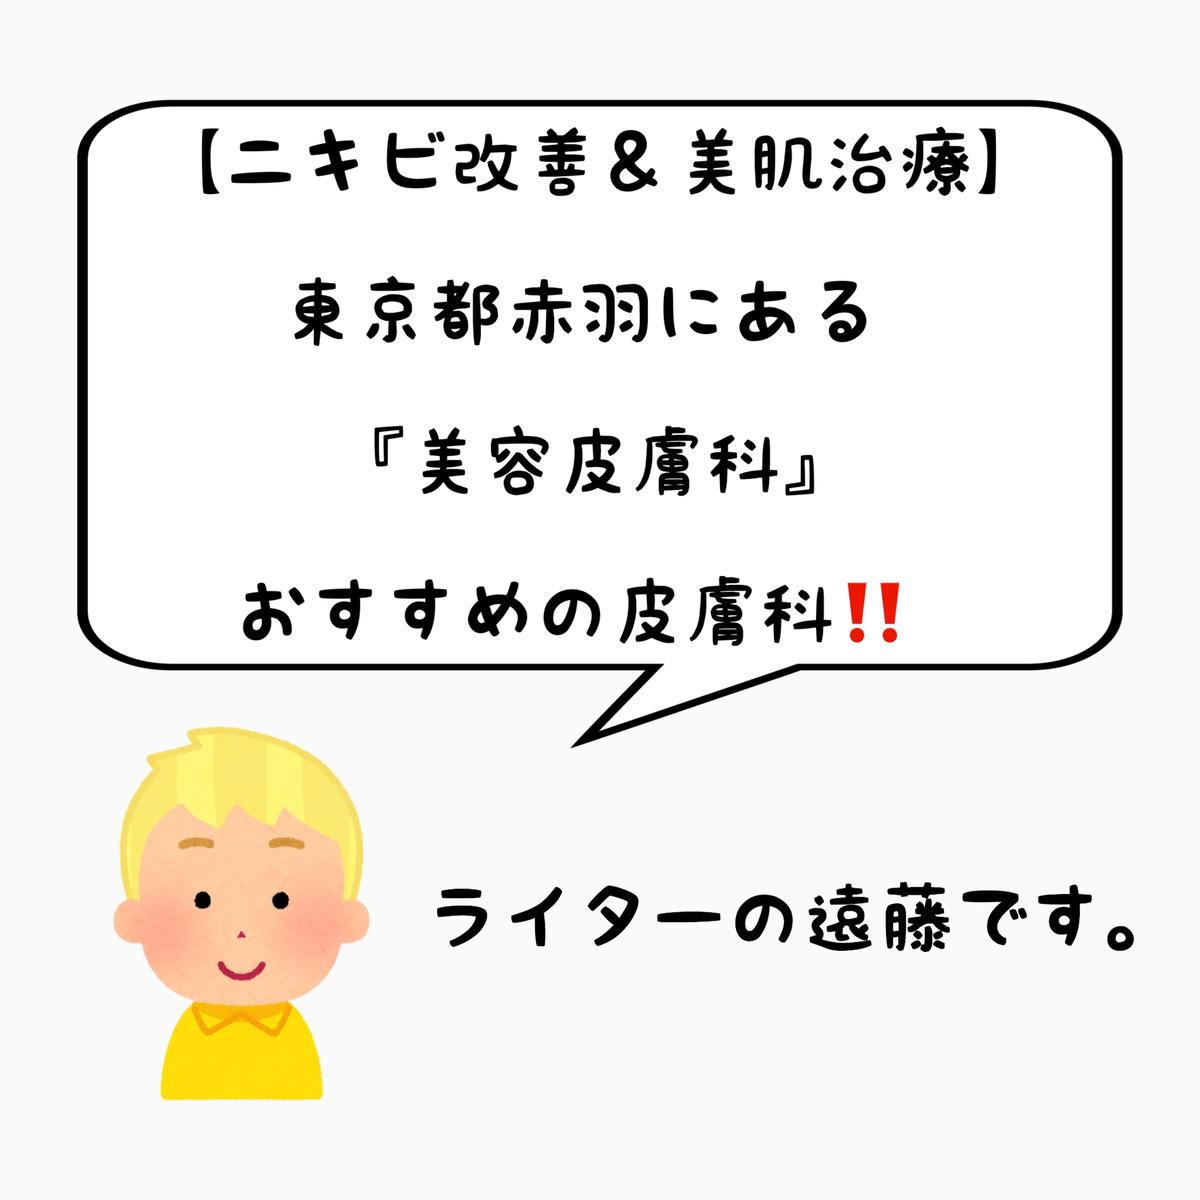 f:id:nokonoko_o:20201210105234j:plain